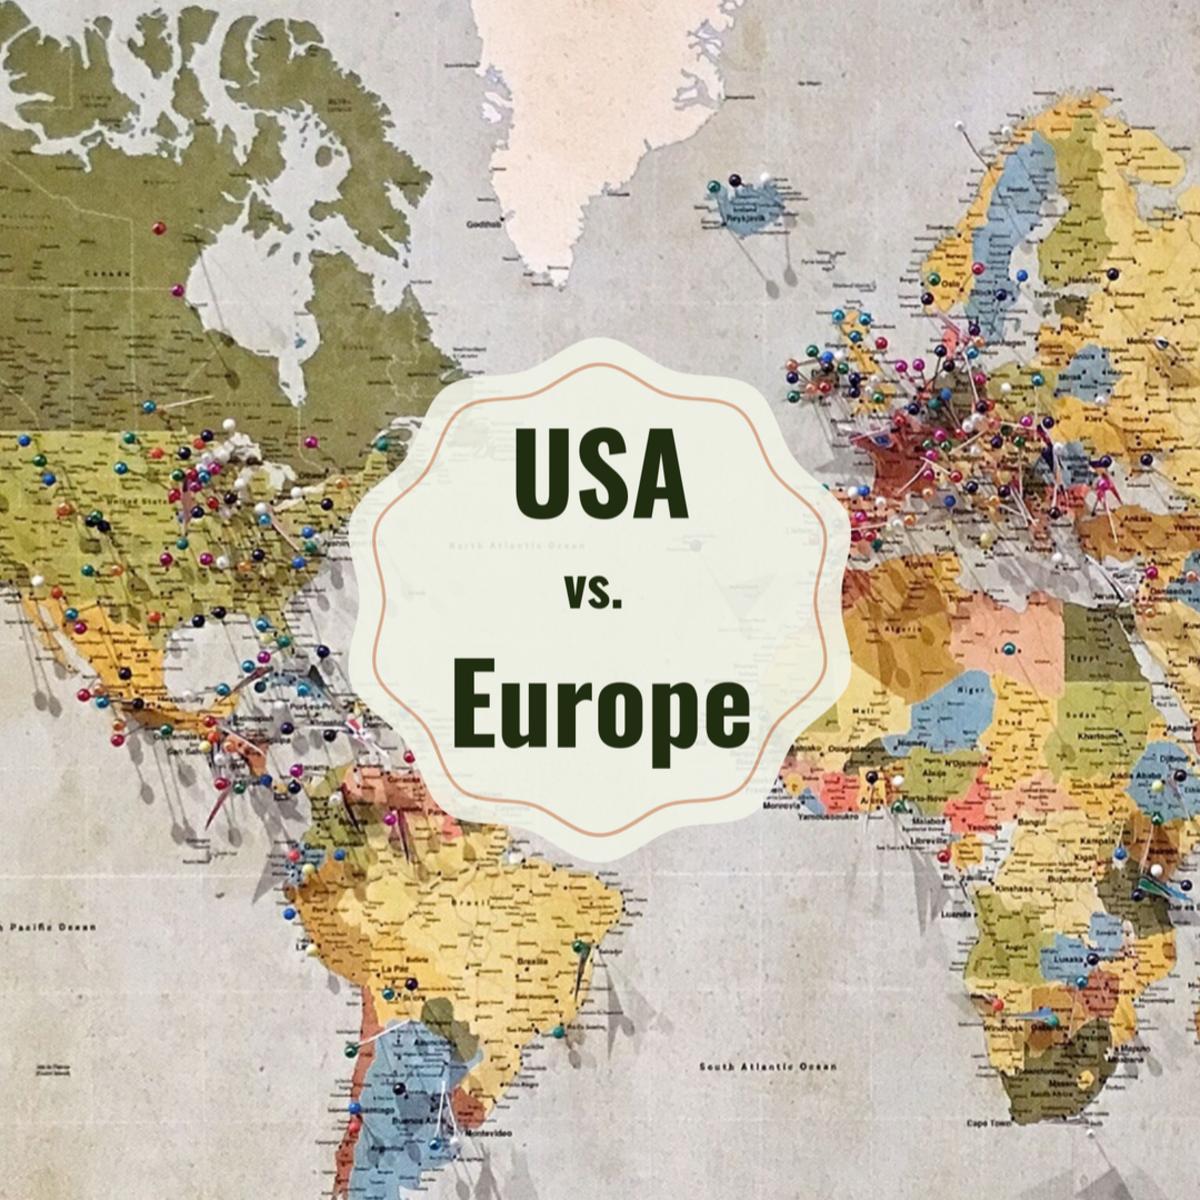 USA vs. Europe: Ten Reasons Europe Is Better Than the USA